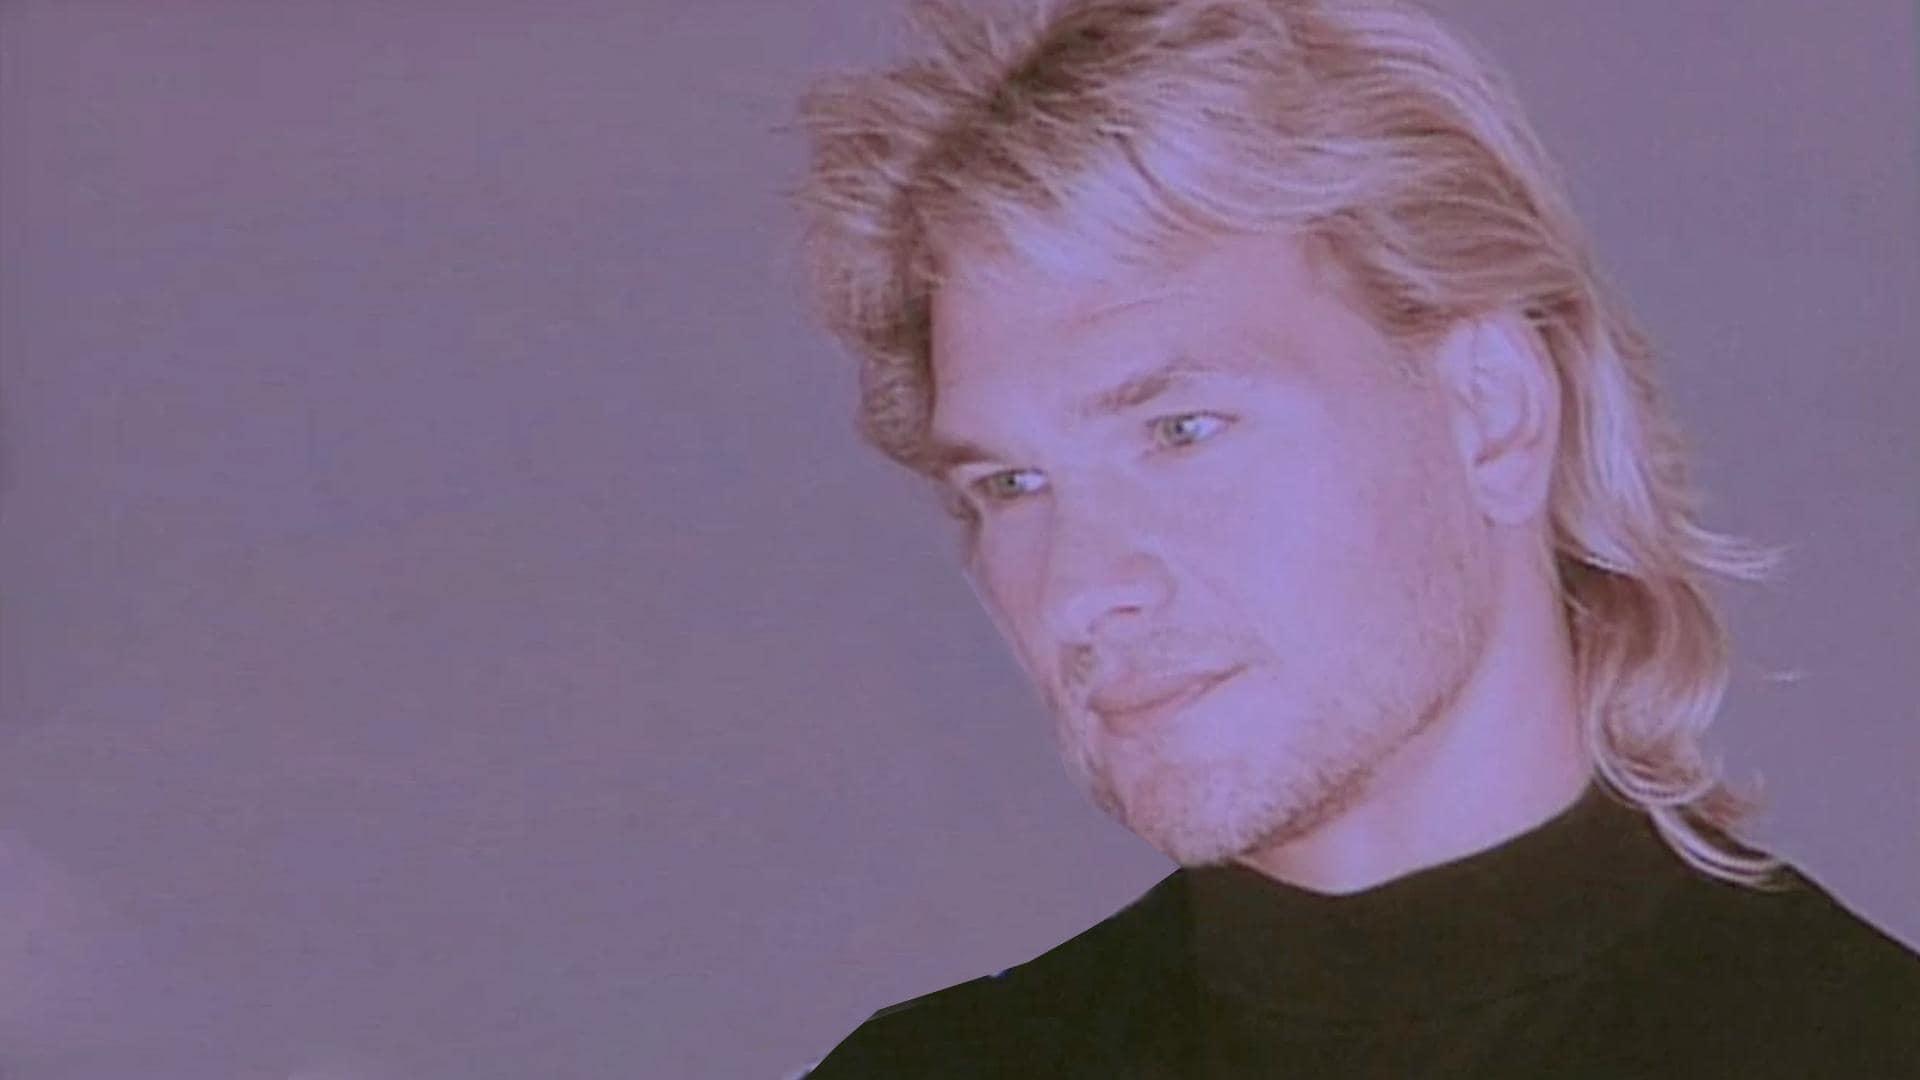 Patrick Swayze: October 27, 1990